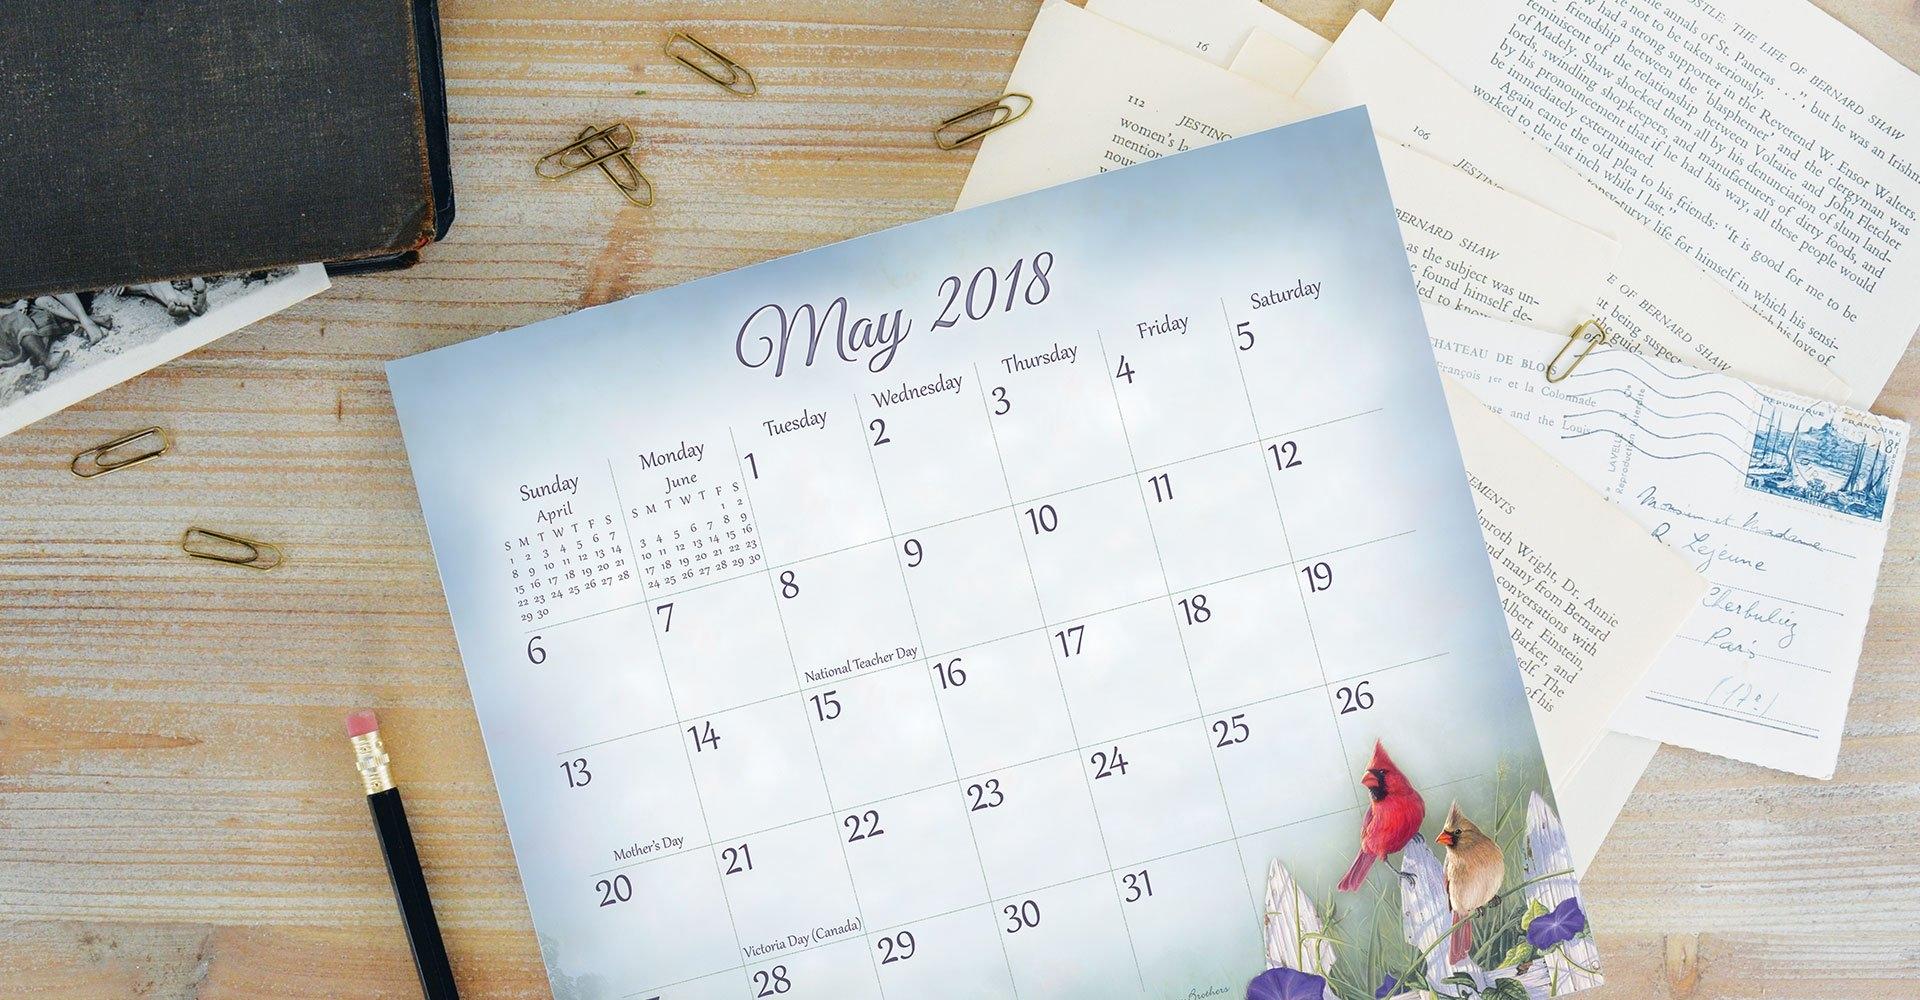 2019 Magnetic Calendars Calendar 2019 Magnet